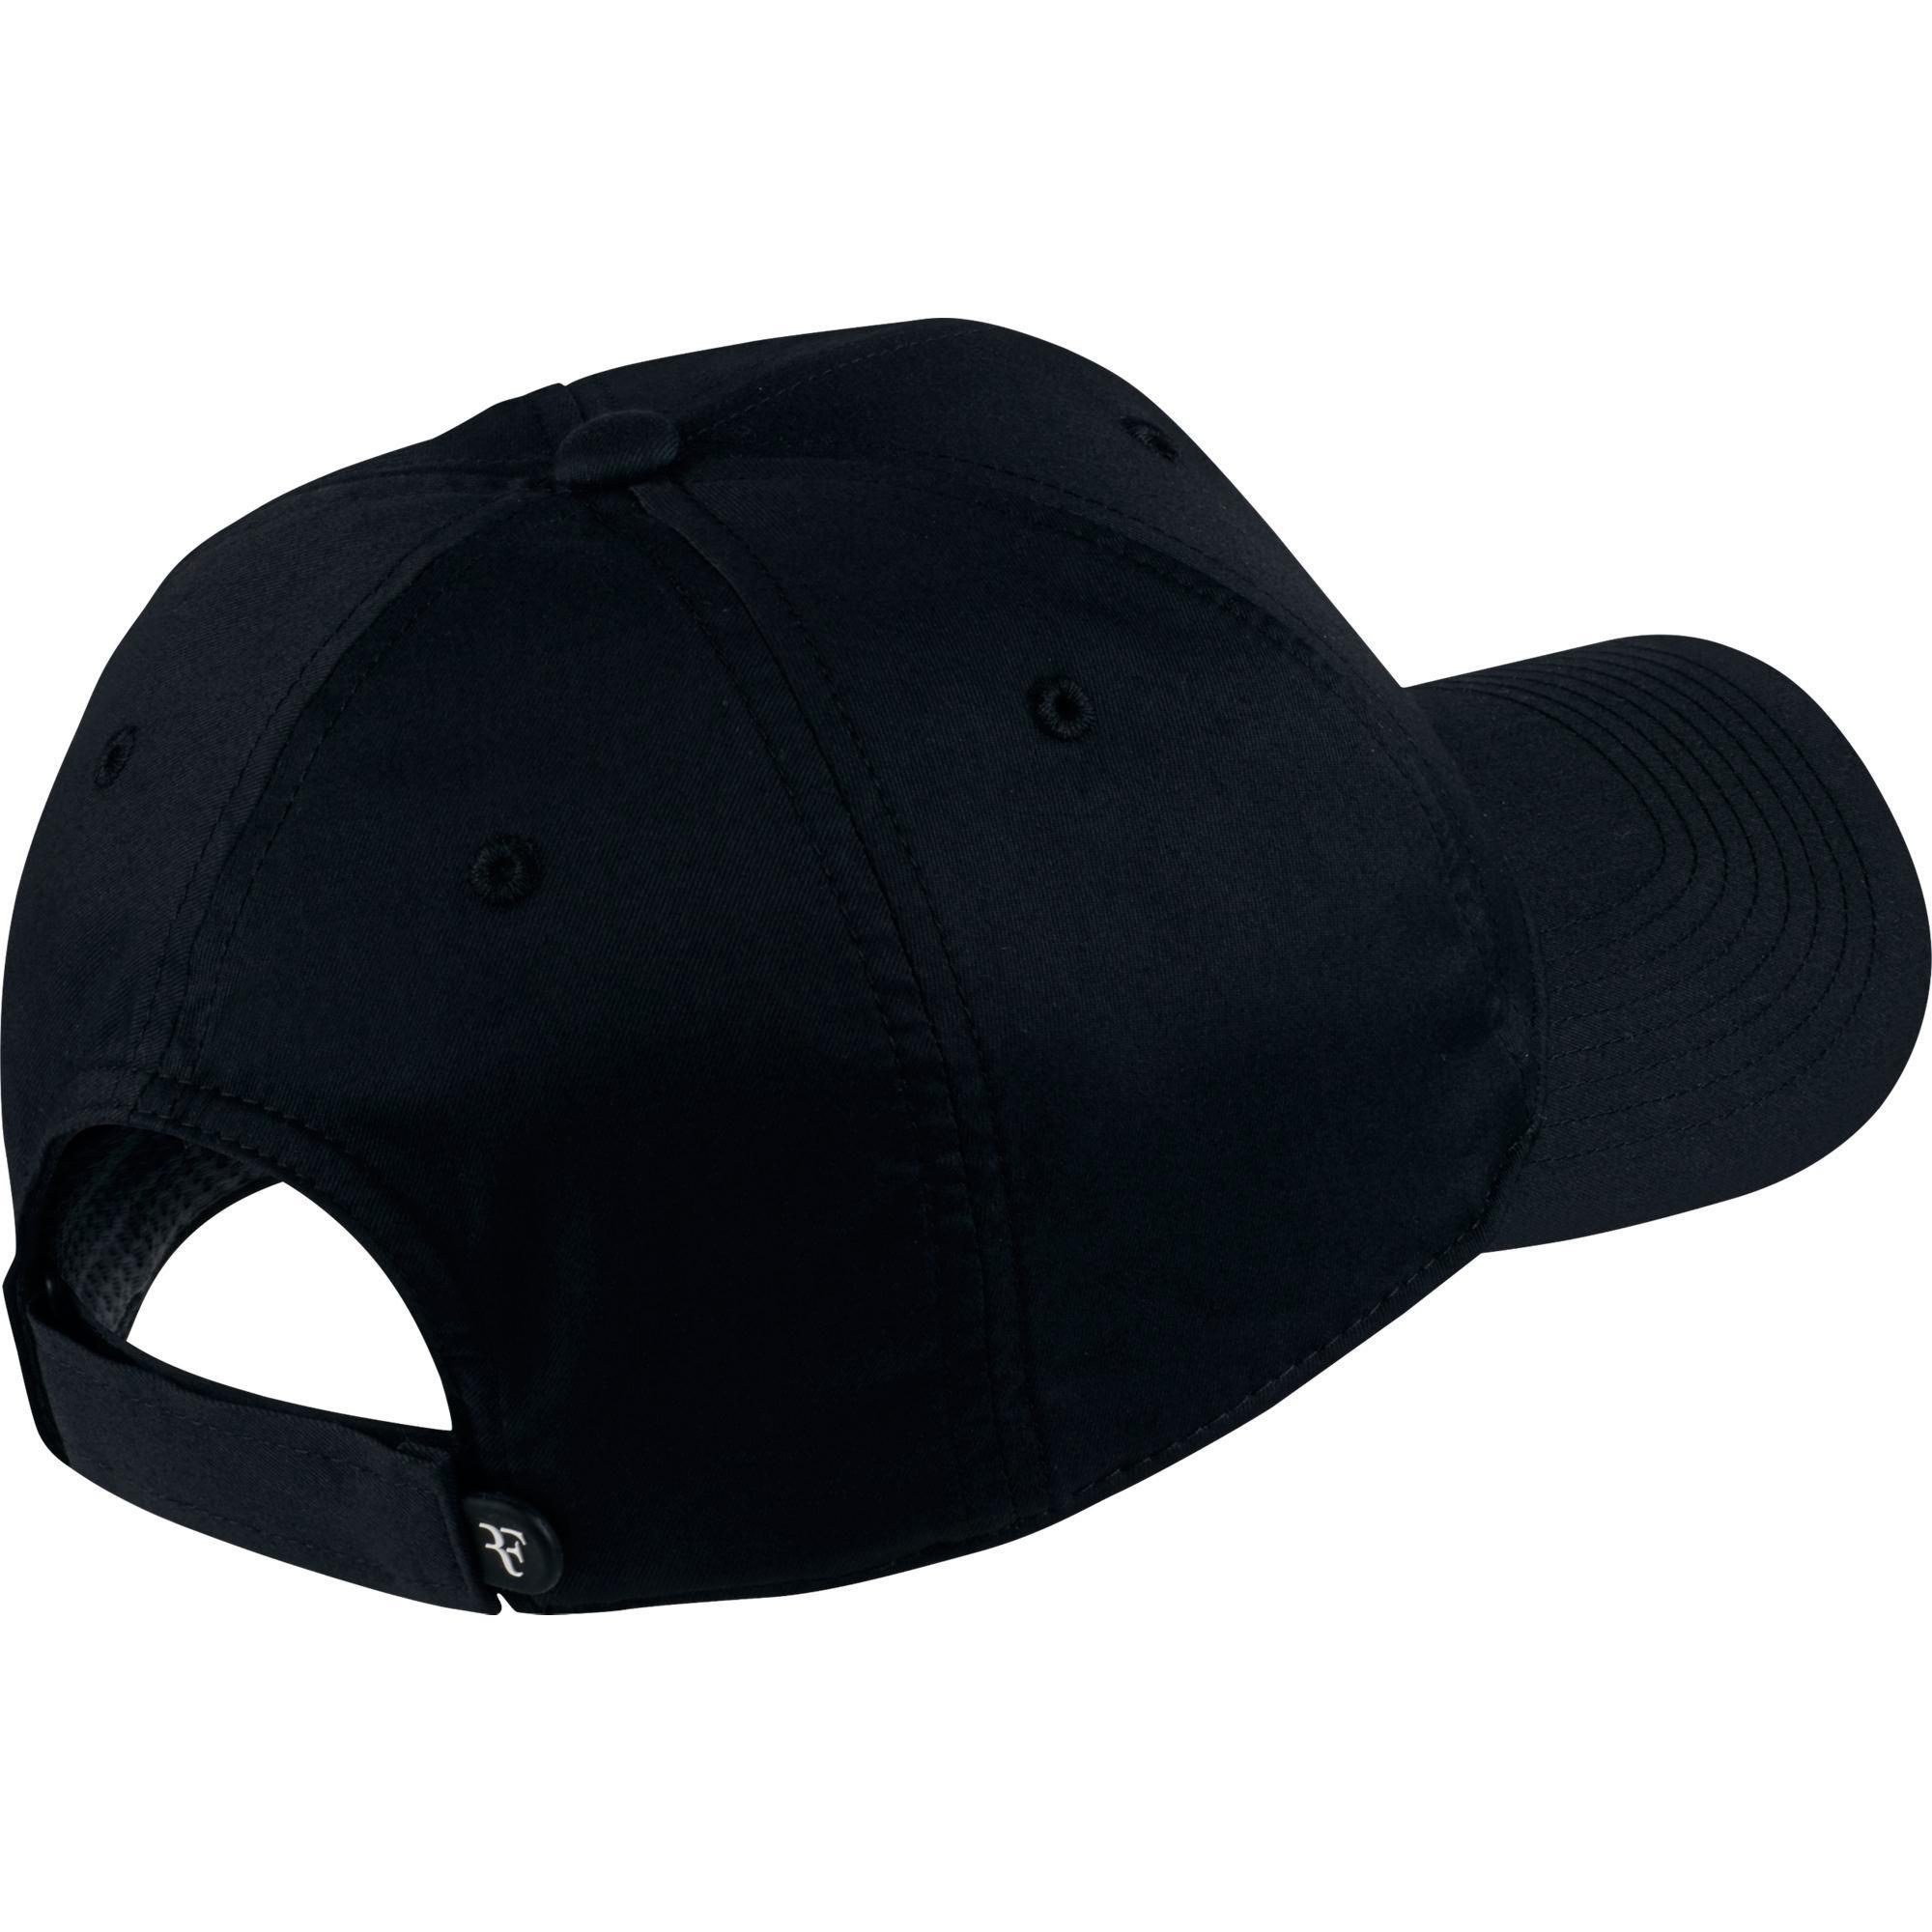 082b92c5585 Nike RF Iridescent Cap - Black Flint Grey - Tennisnuts.com